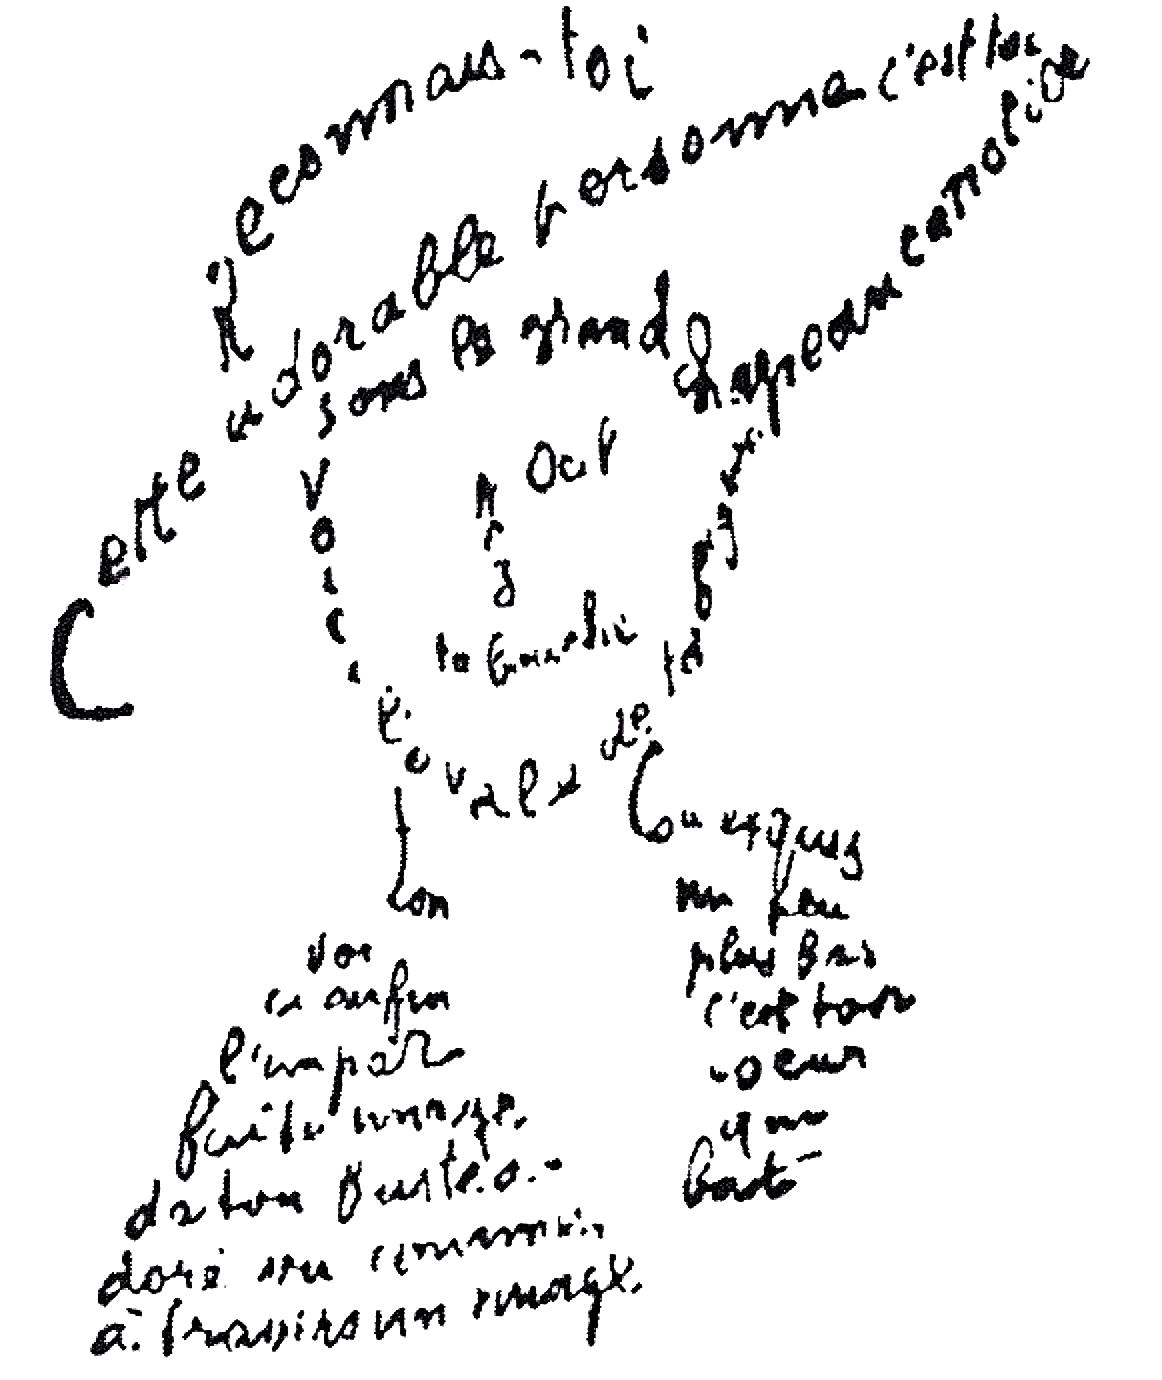 Poeme insolite